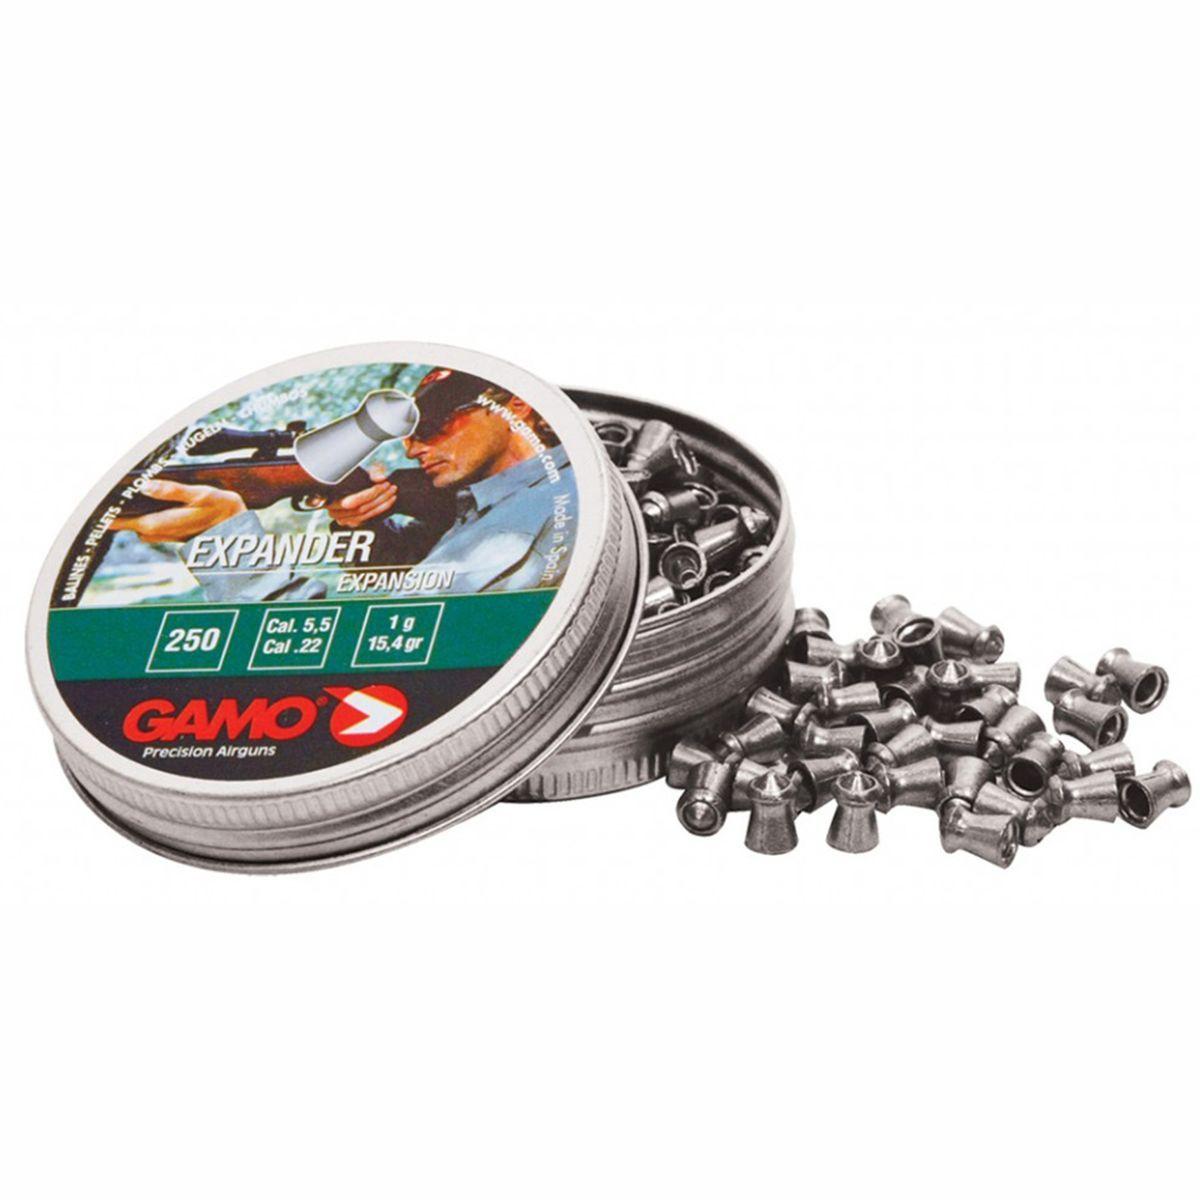 Chumbinho Gamo Expander Expansion Cal. 5,5mm - 250 unidades